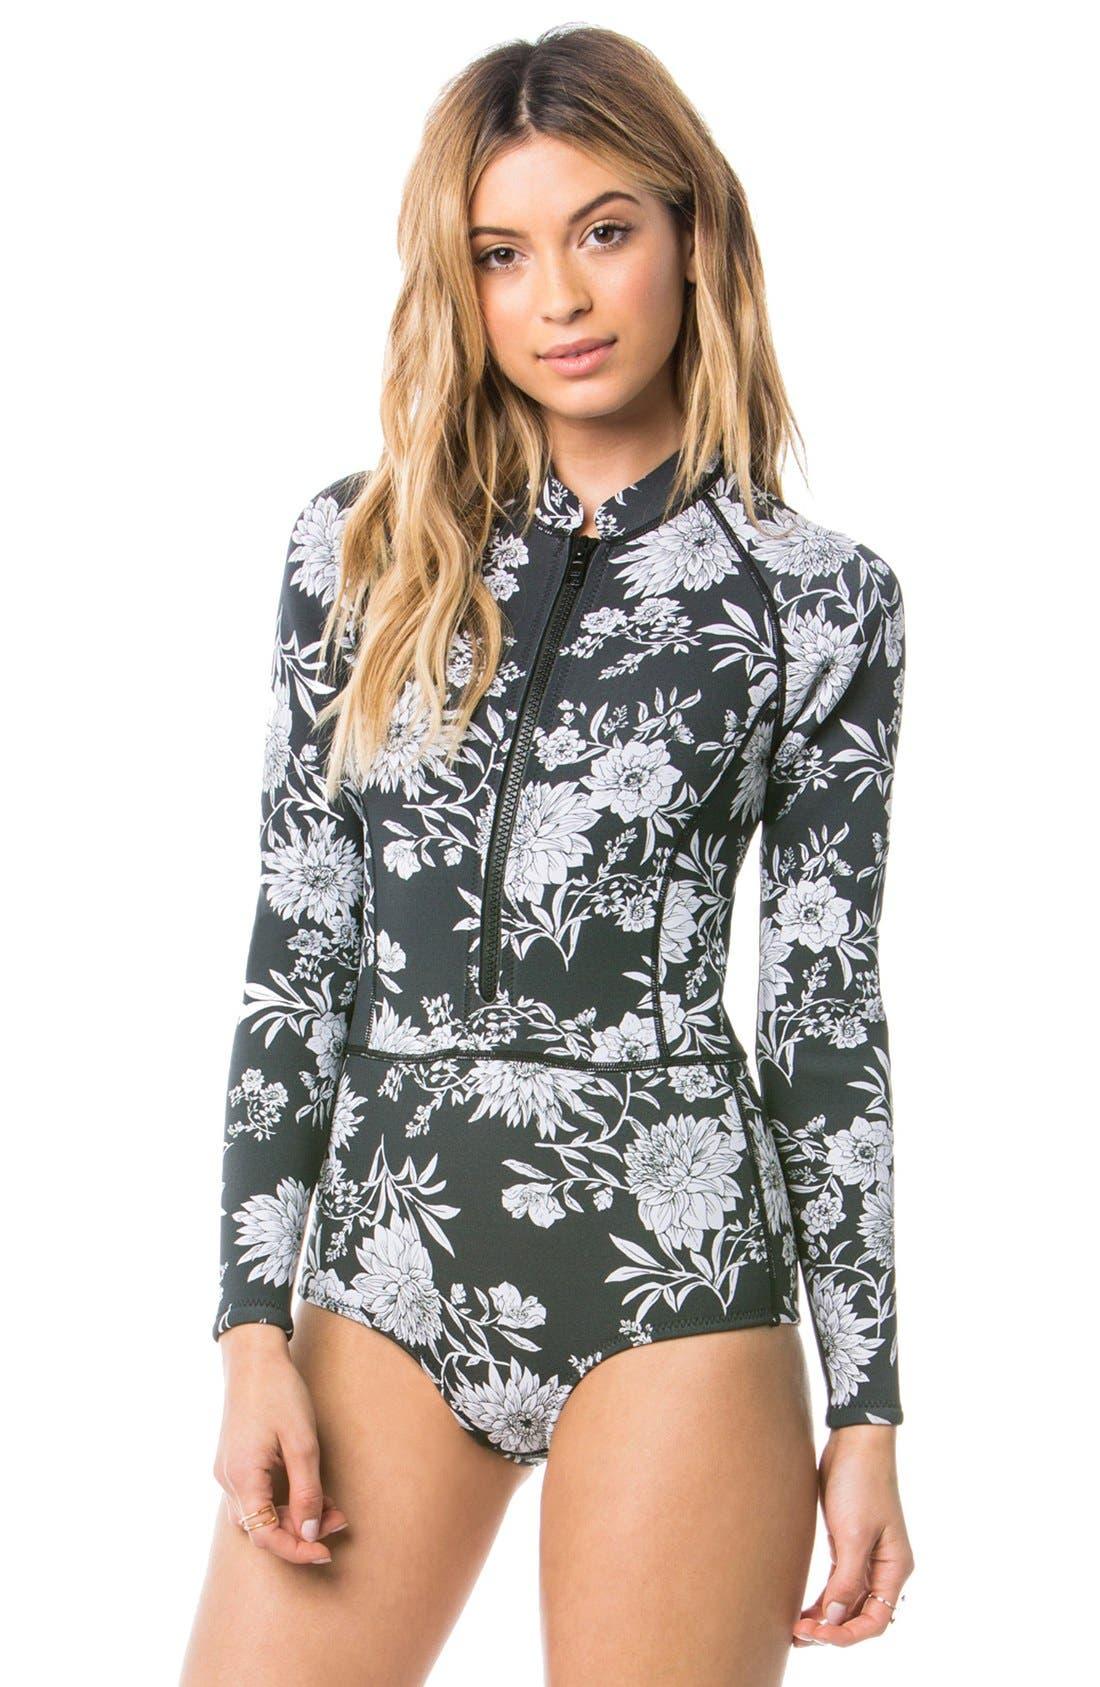 Main Image - Amuse Society 'Makala' Floral Print Long Sleeve One-Piece Swimsuit